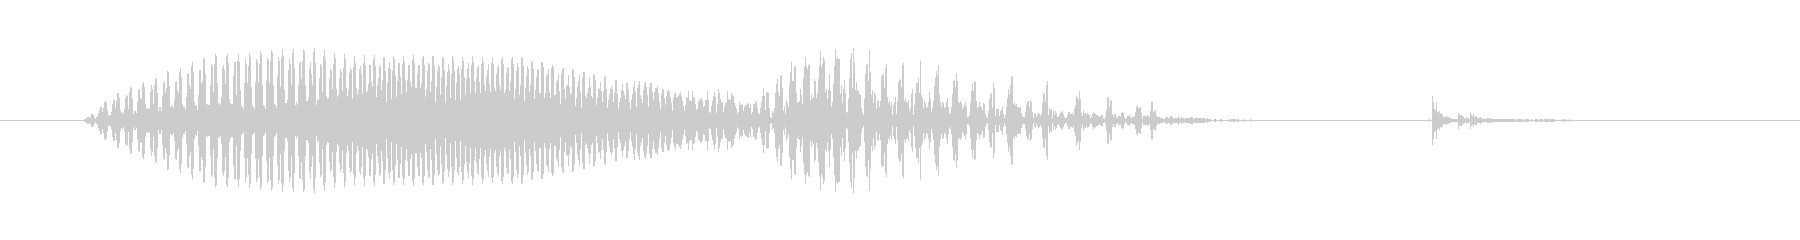 Music (ミュージック、英語、米国…の未再生の波形